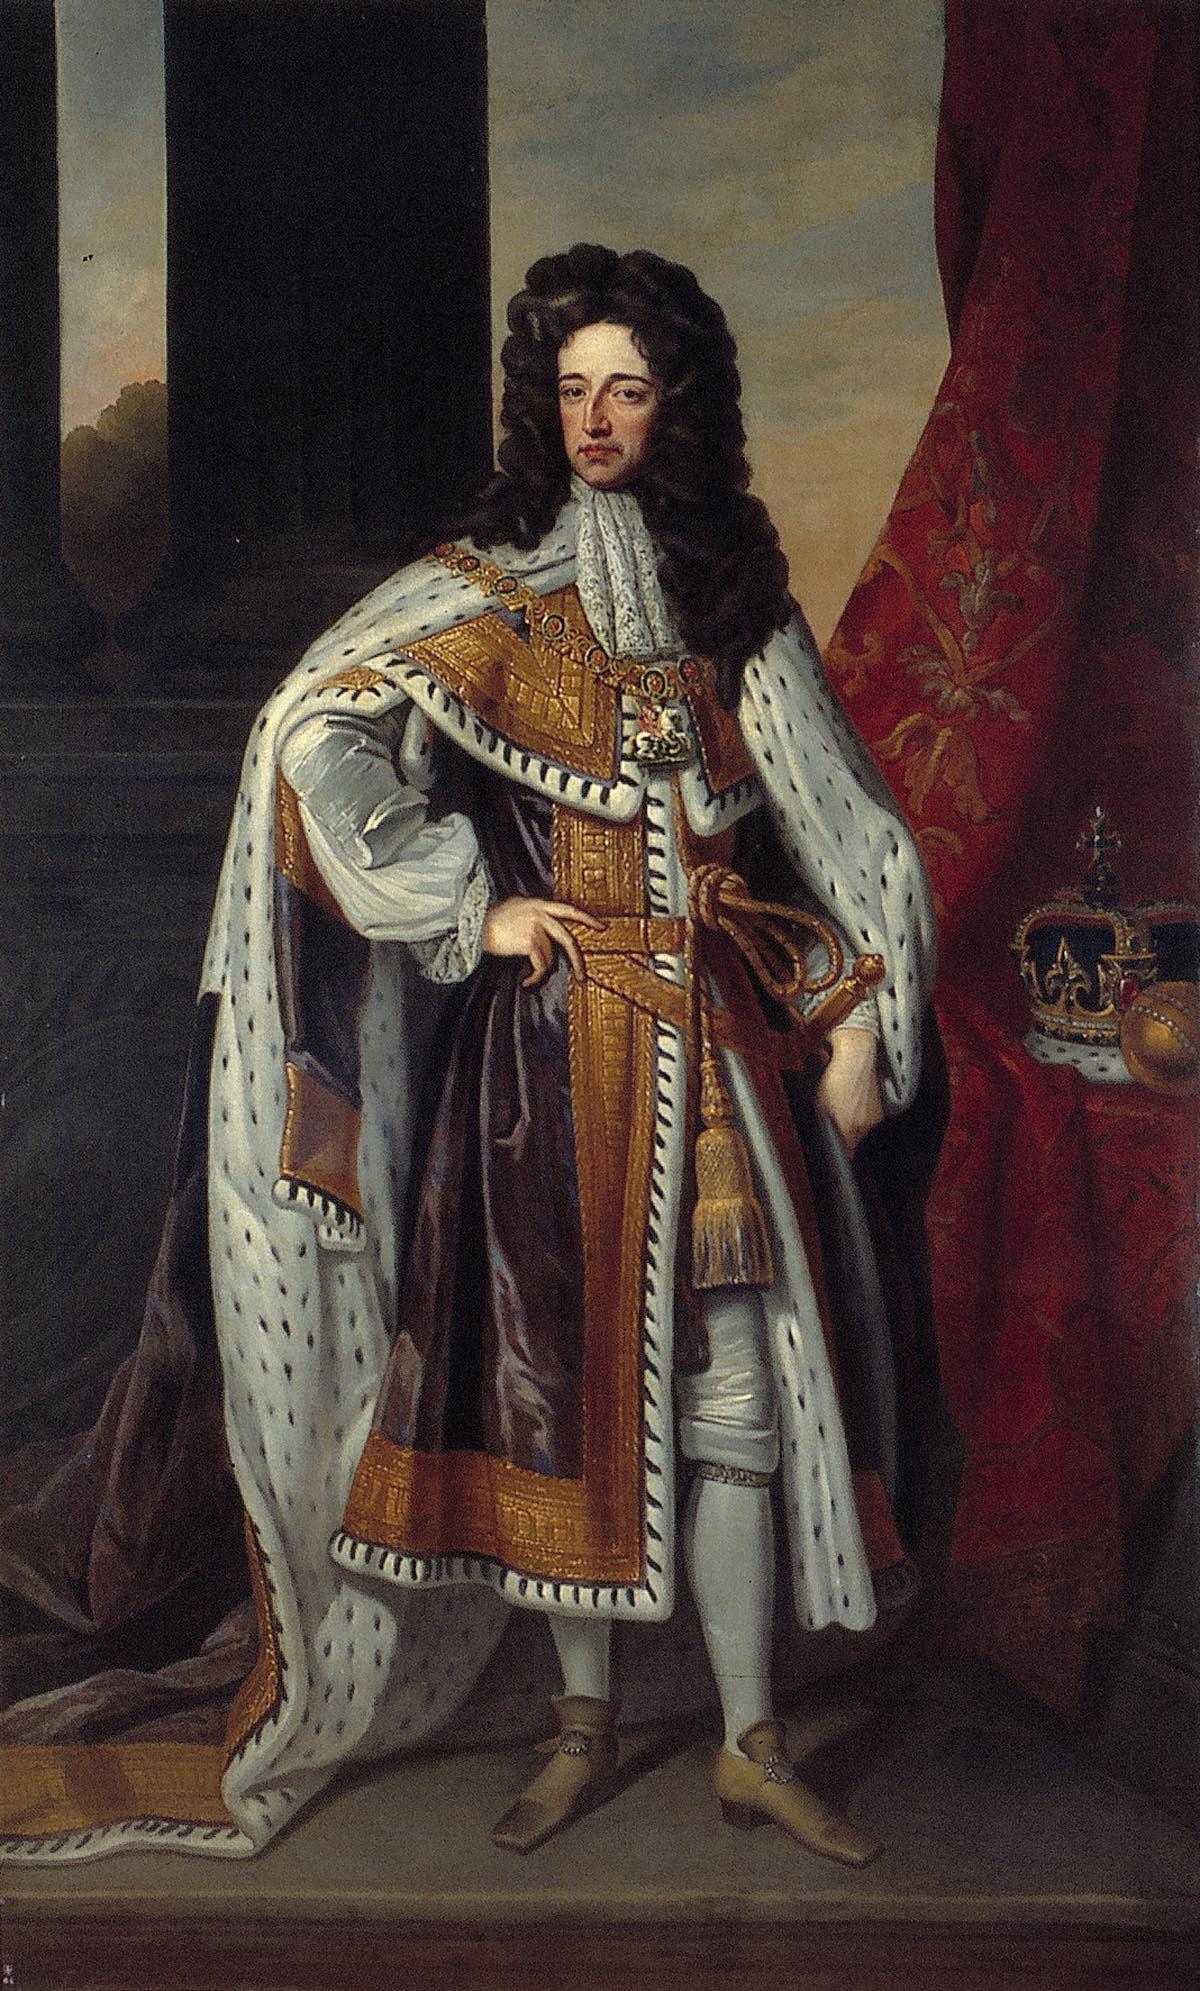 III. Vilmos, 1688-1689 k. Holland Kulturális Örökség Intézete, C252